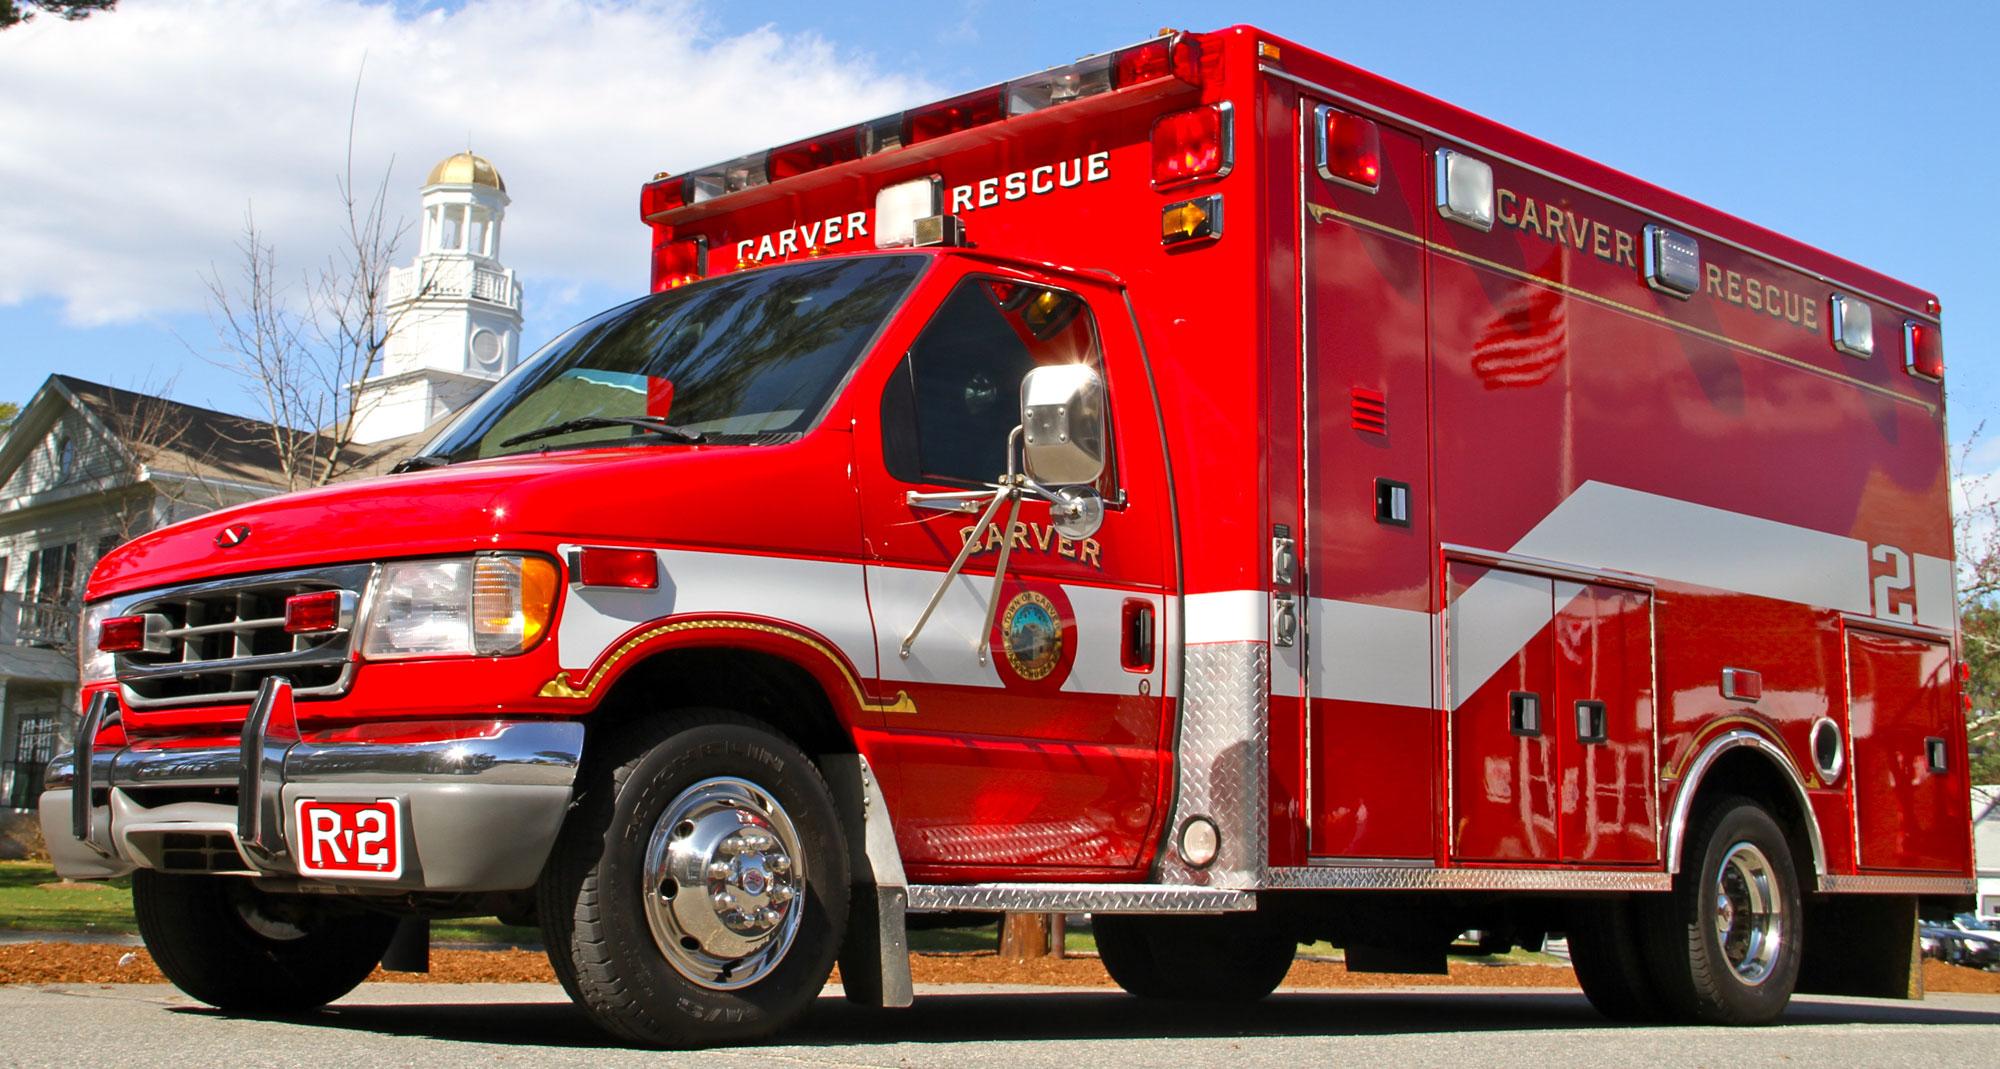 rescue-2-main-photo-edited